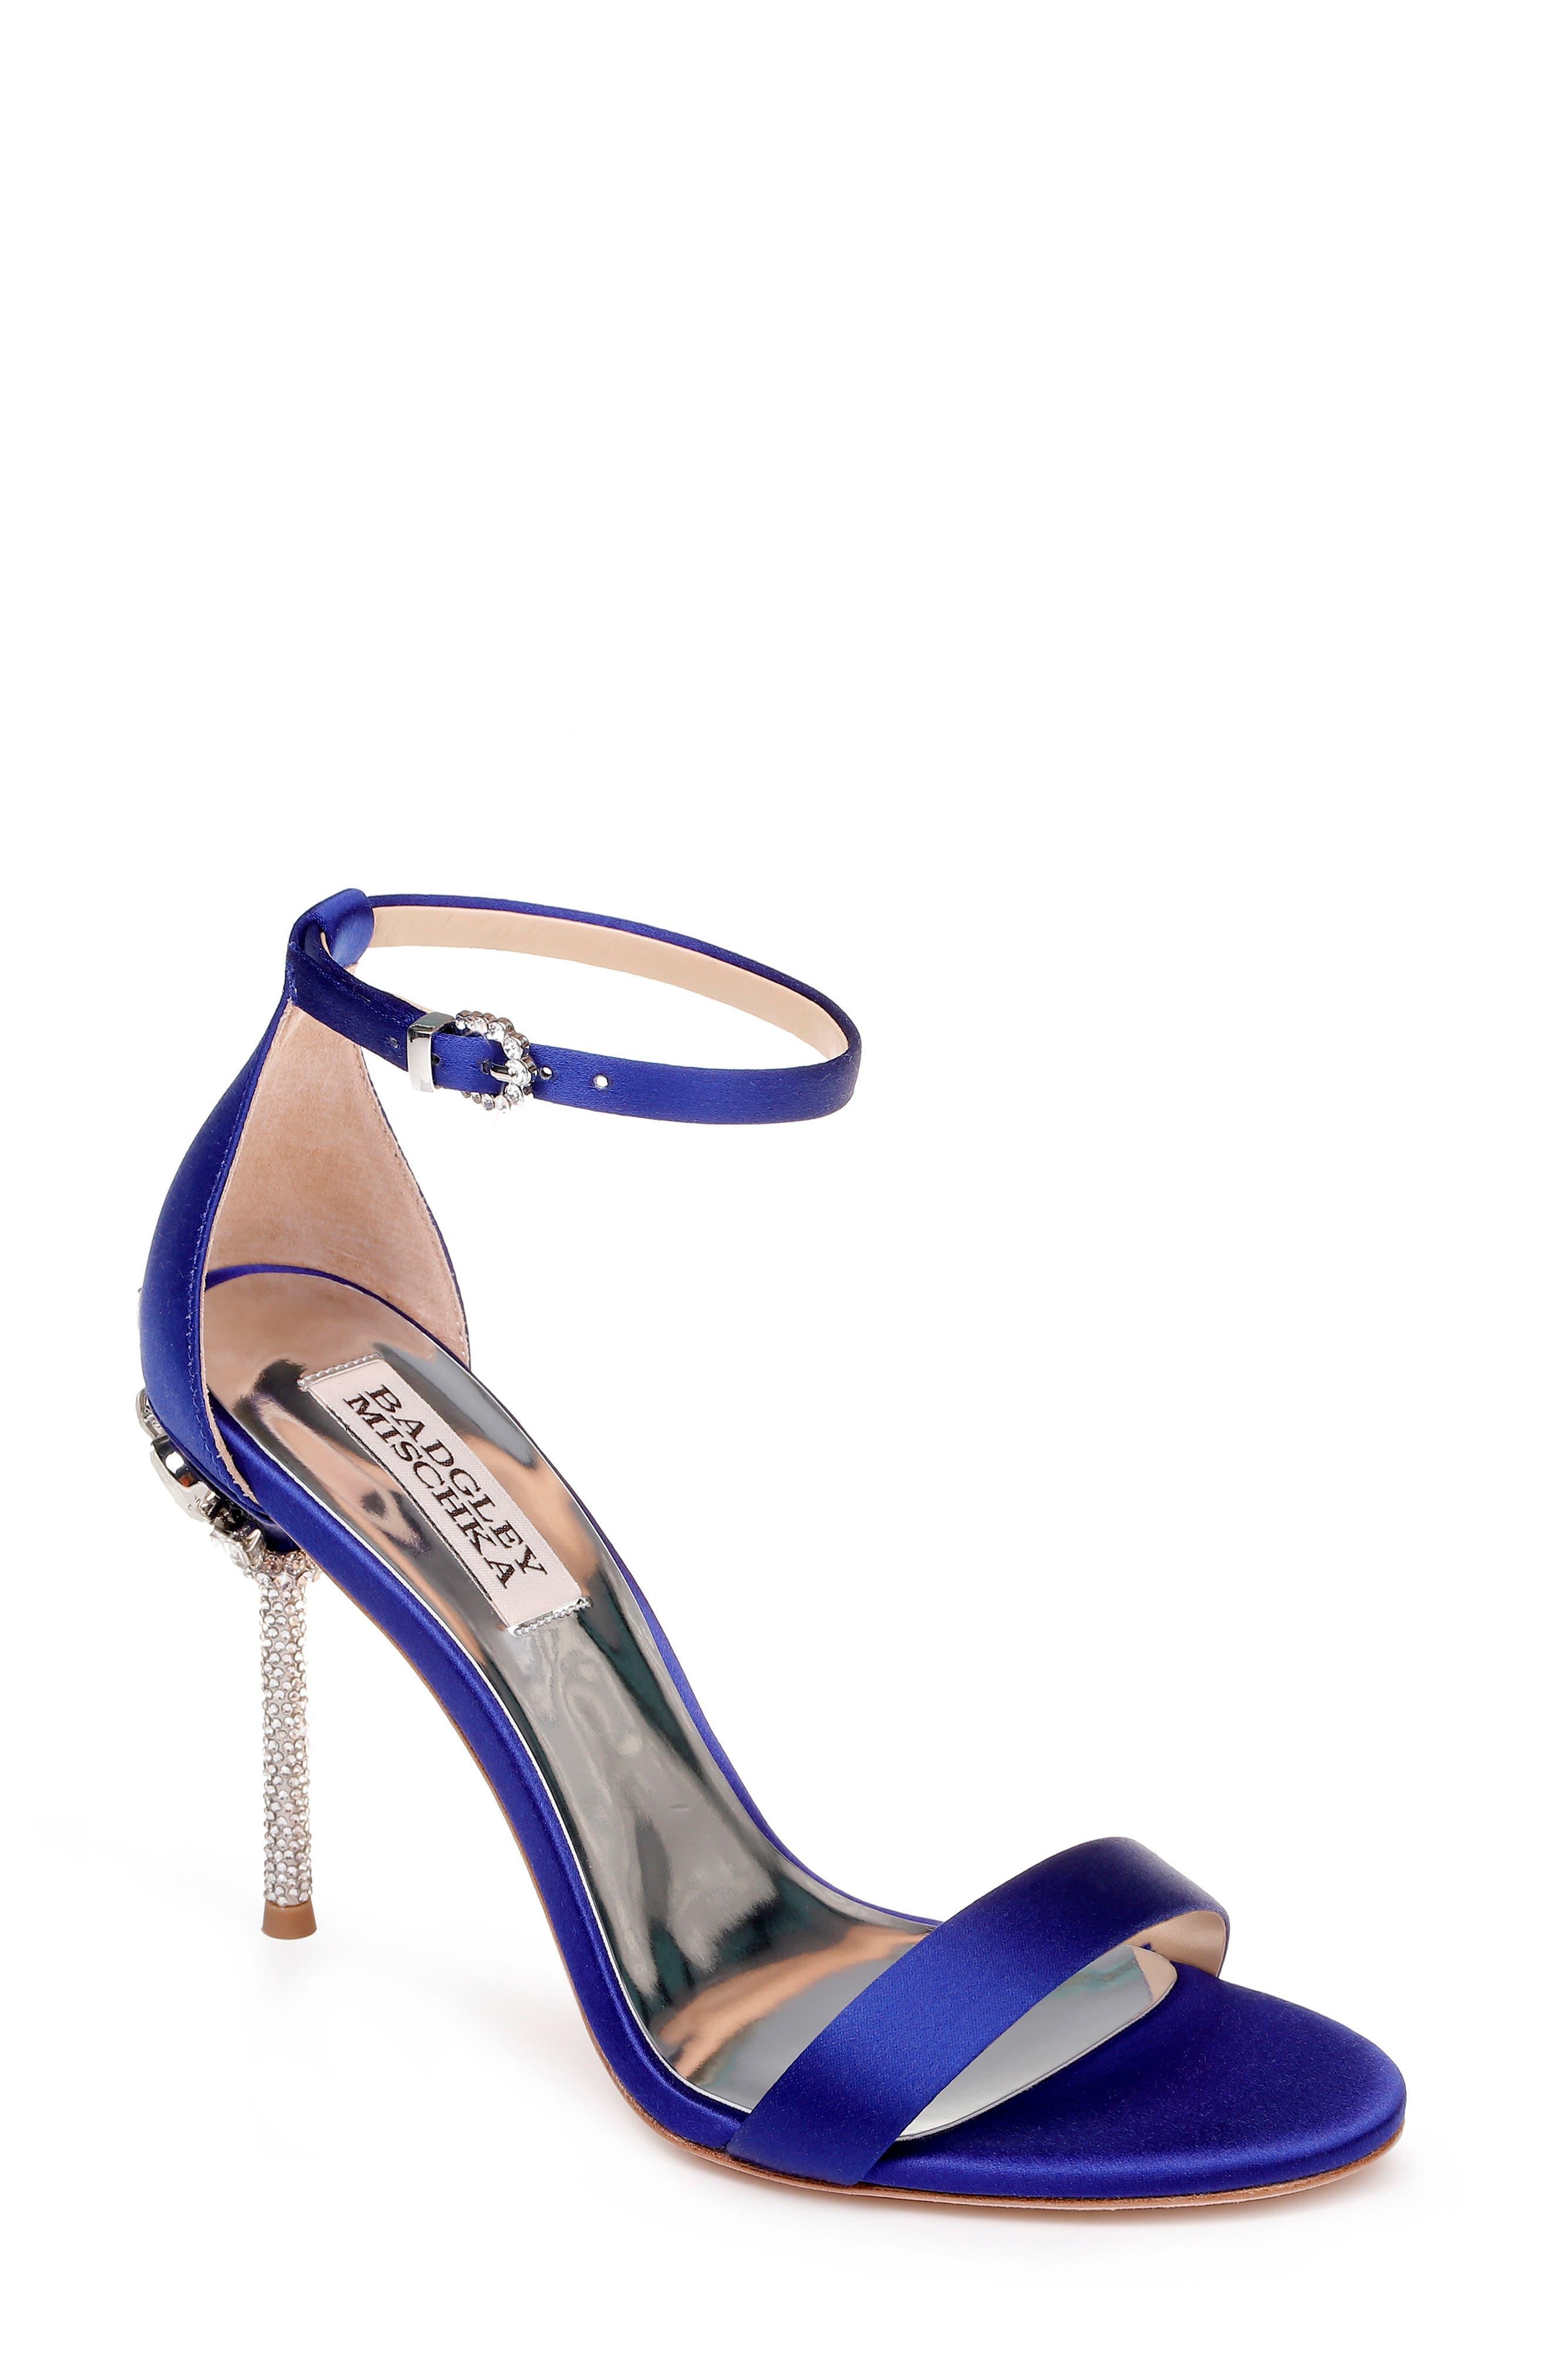 Badgley Mischka Vicia Crystal Embellished Heel Sandal, Blue